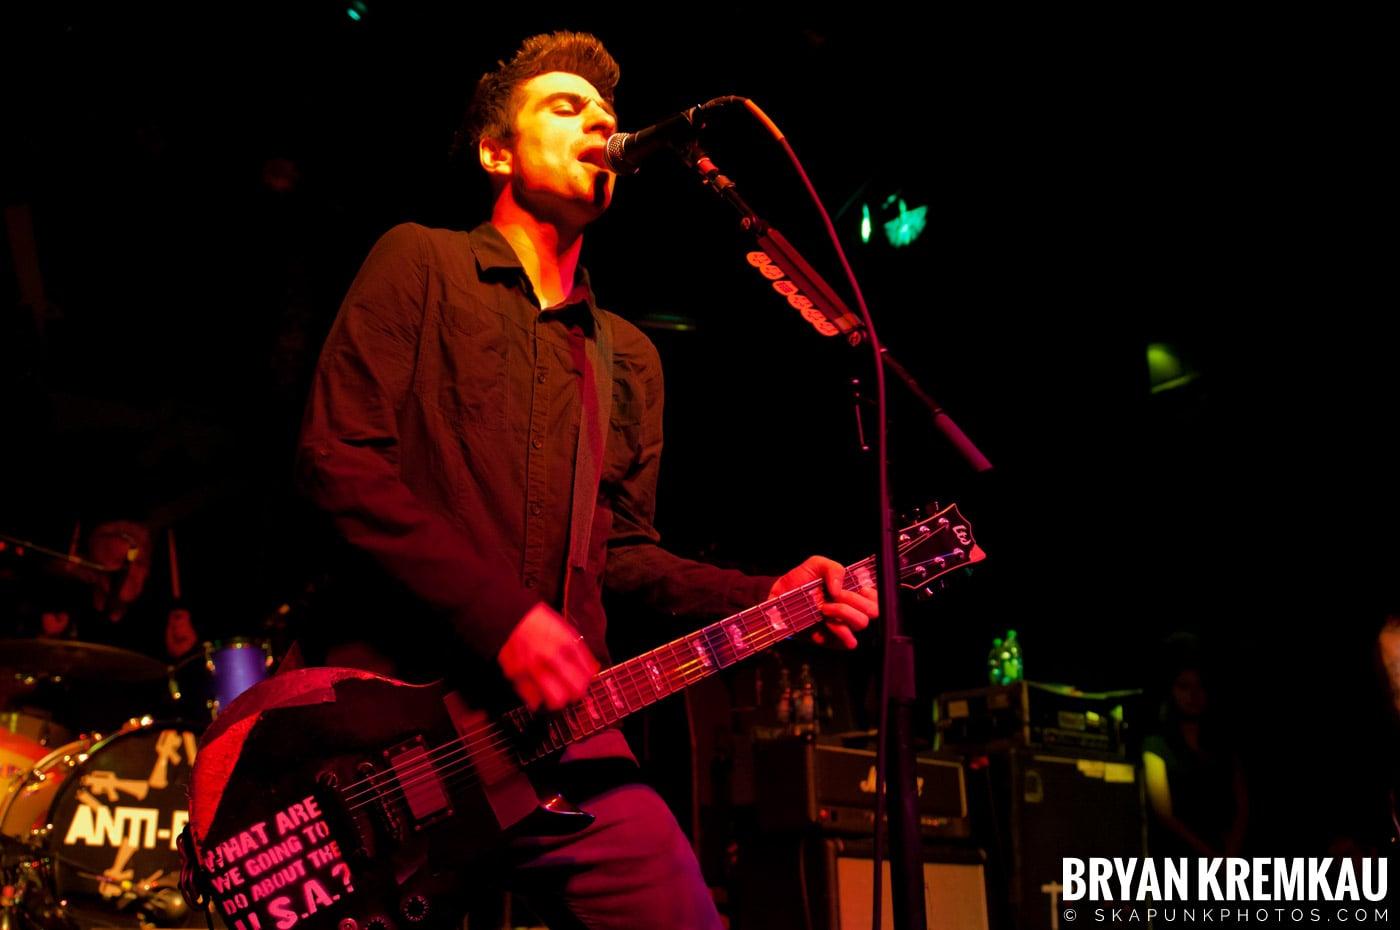 Anti-Flag @ Irving Plaza, NYC - 10.8.11 (10)